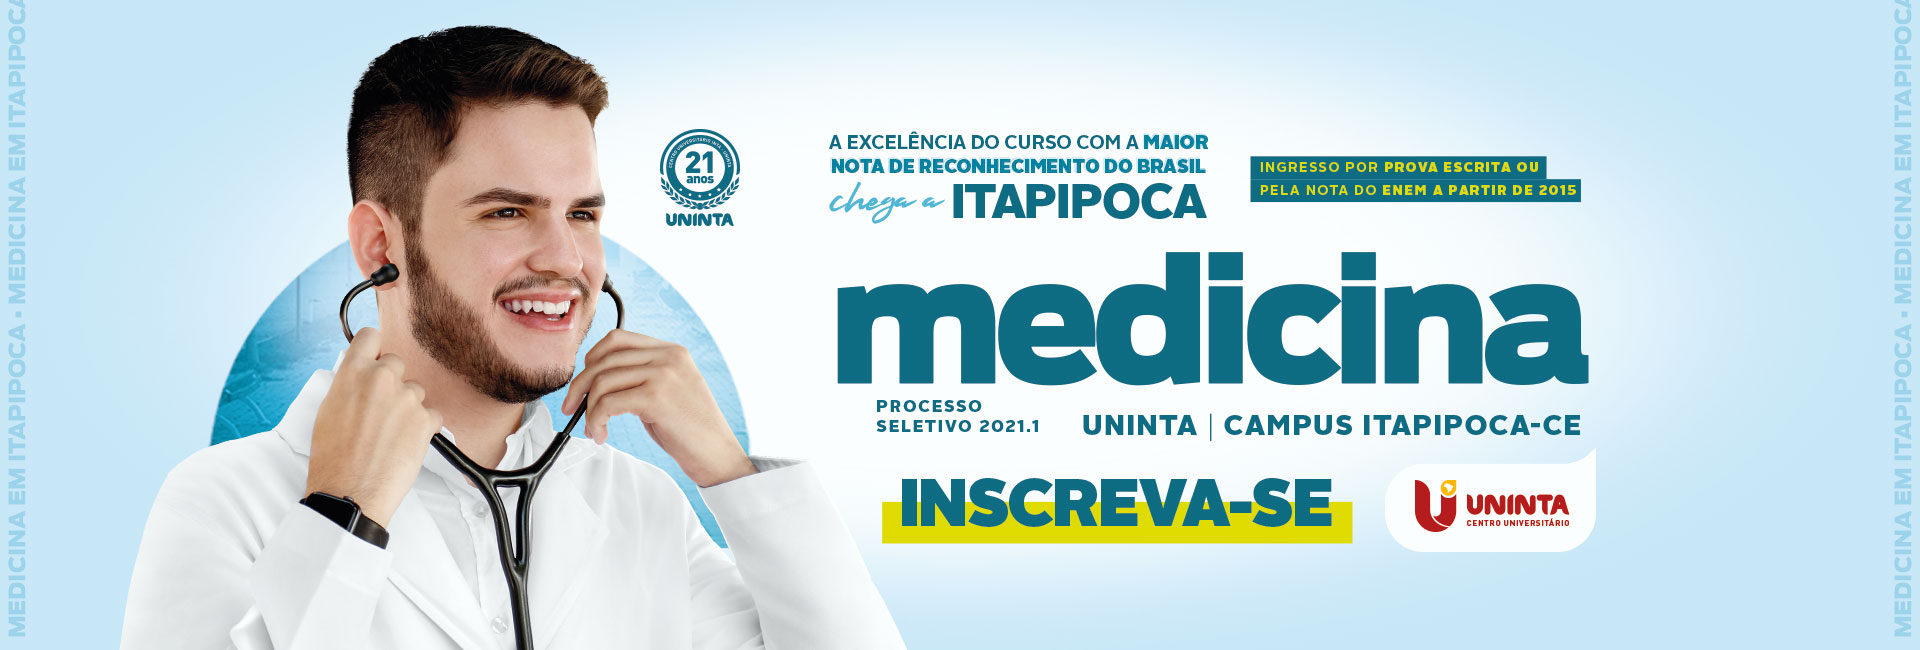 Medicina - UNINTA / Campus Itapipoca-CE